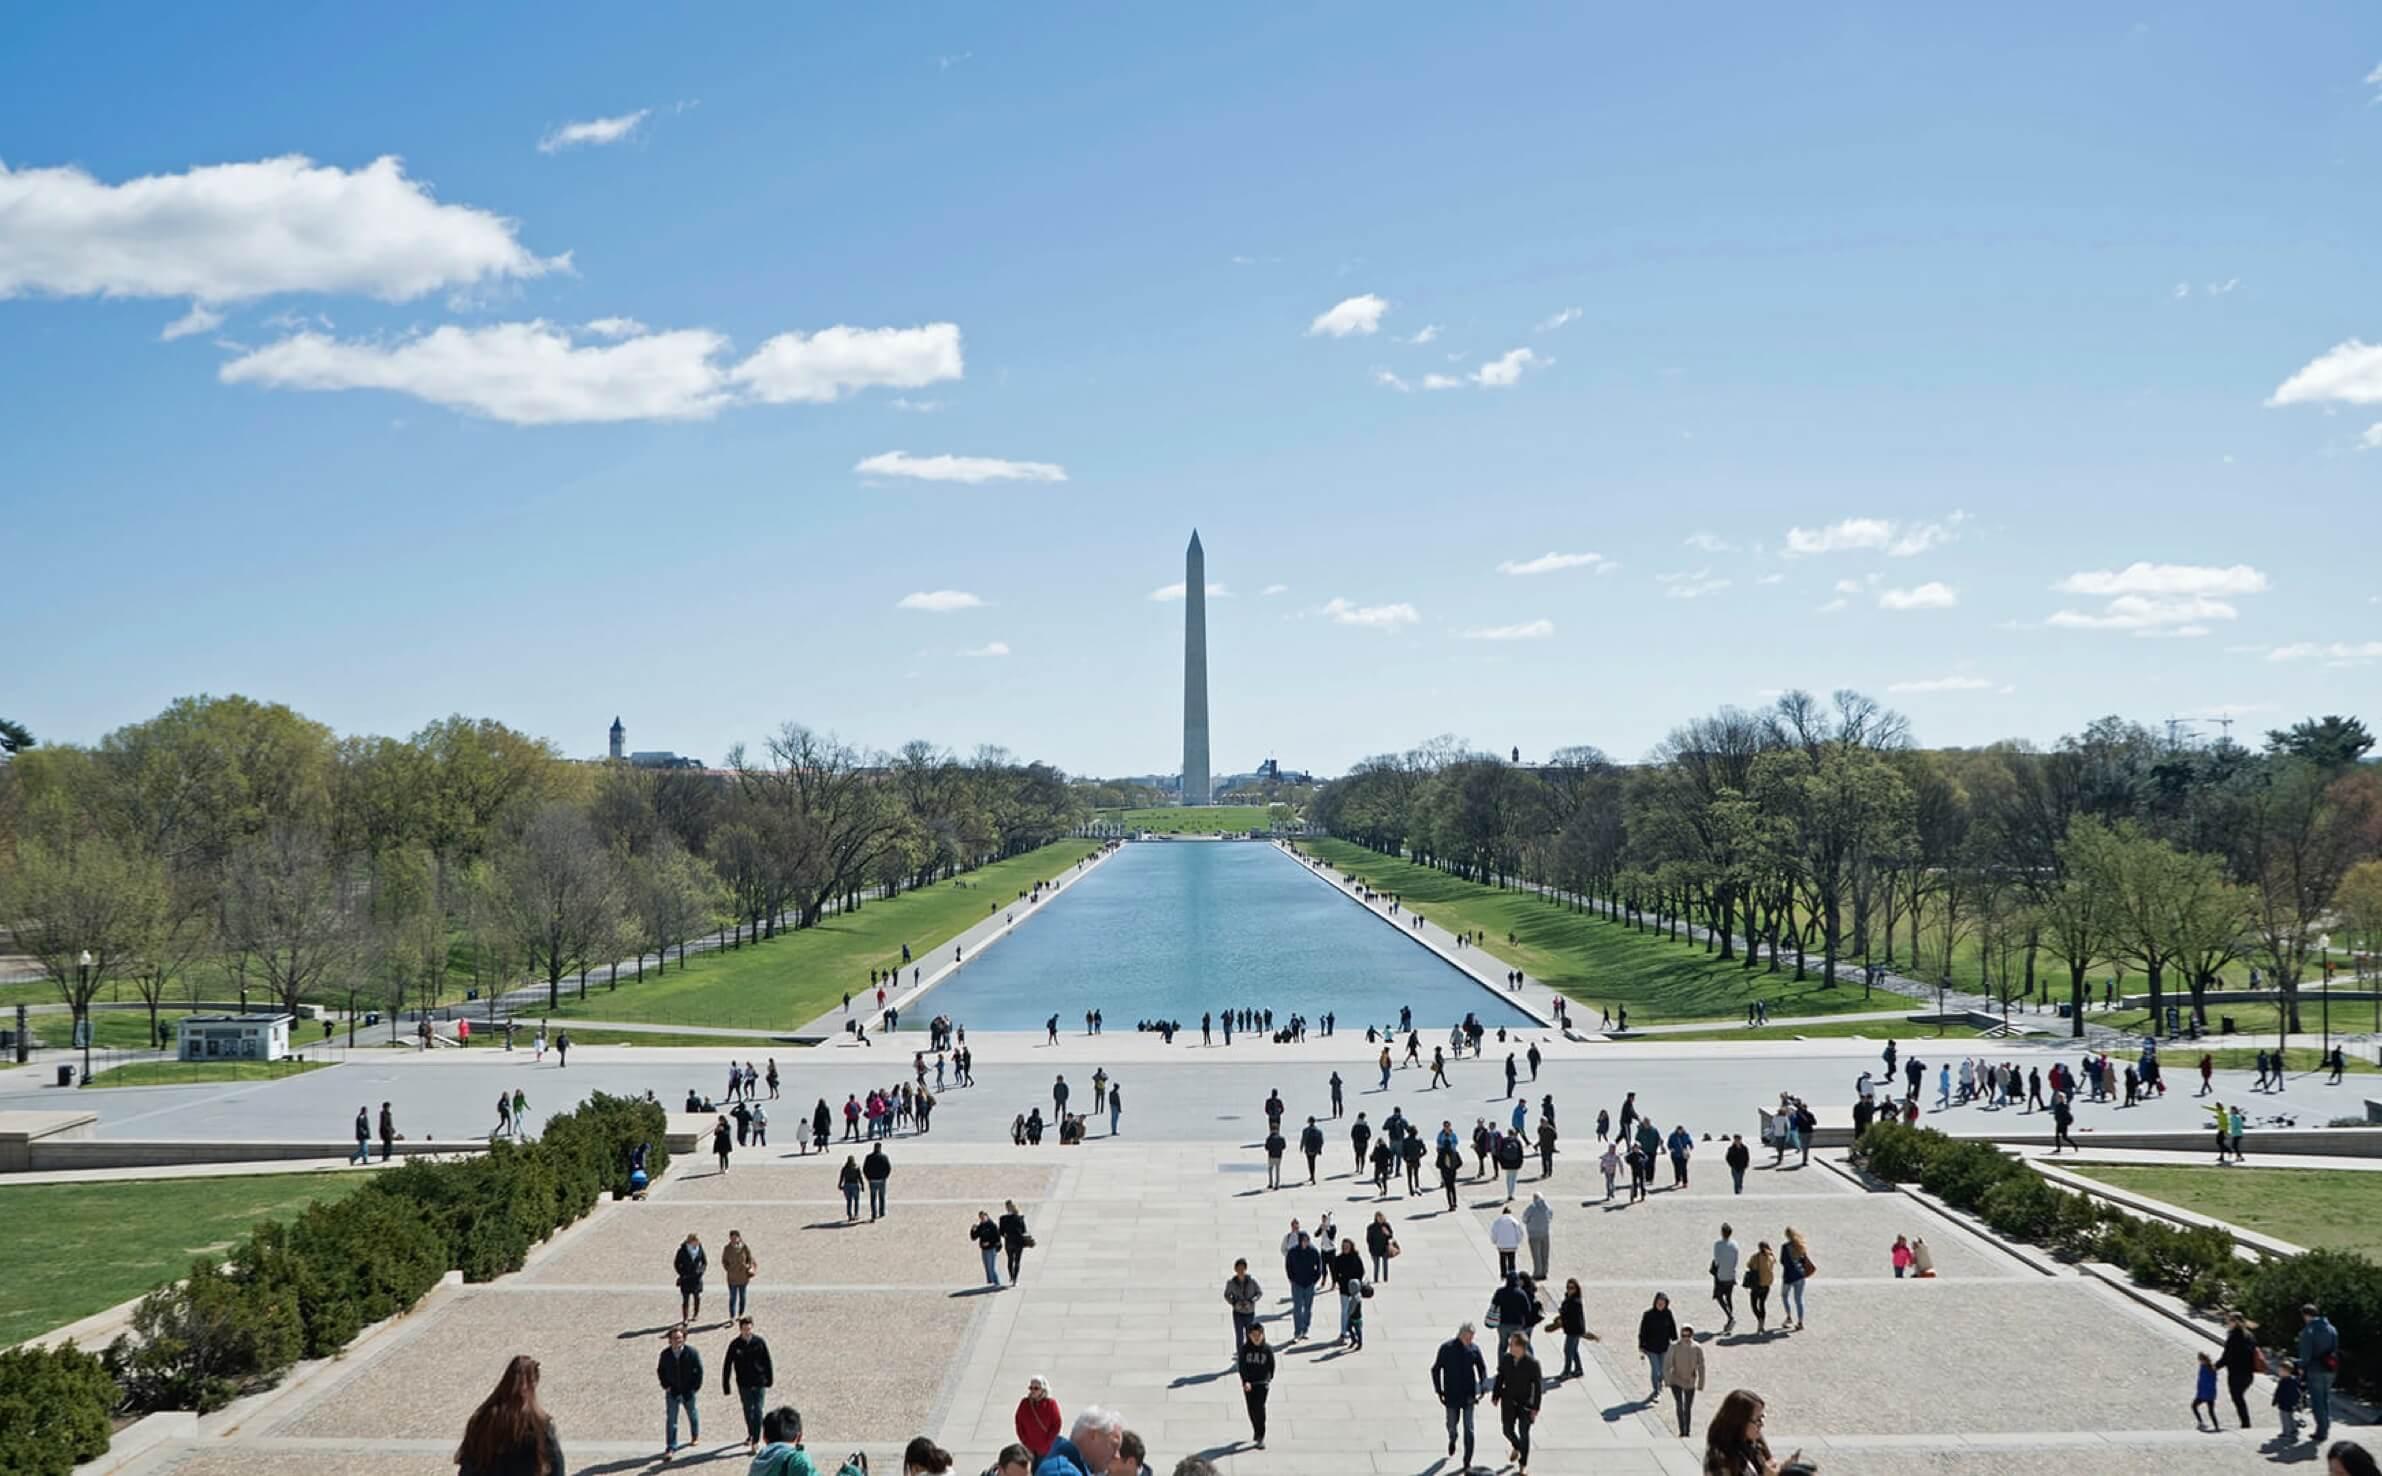 Washington Monument at the National Mall